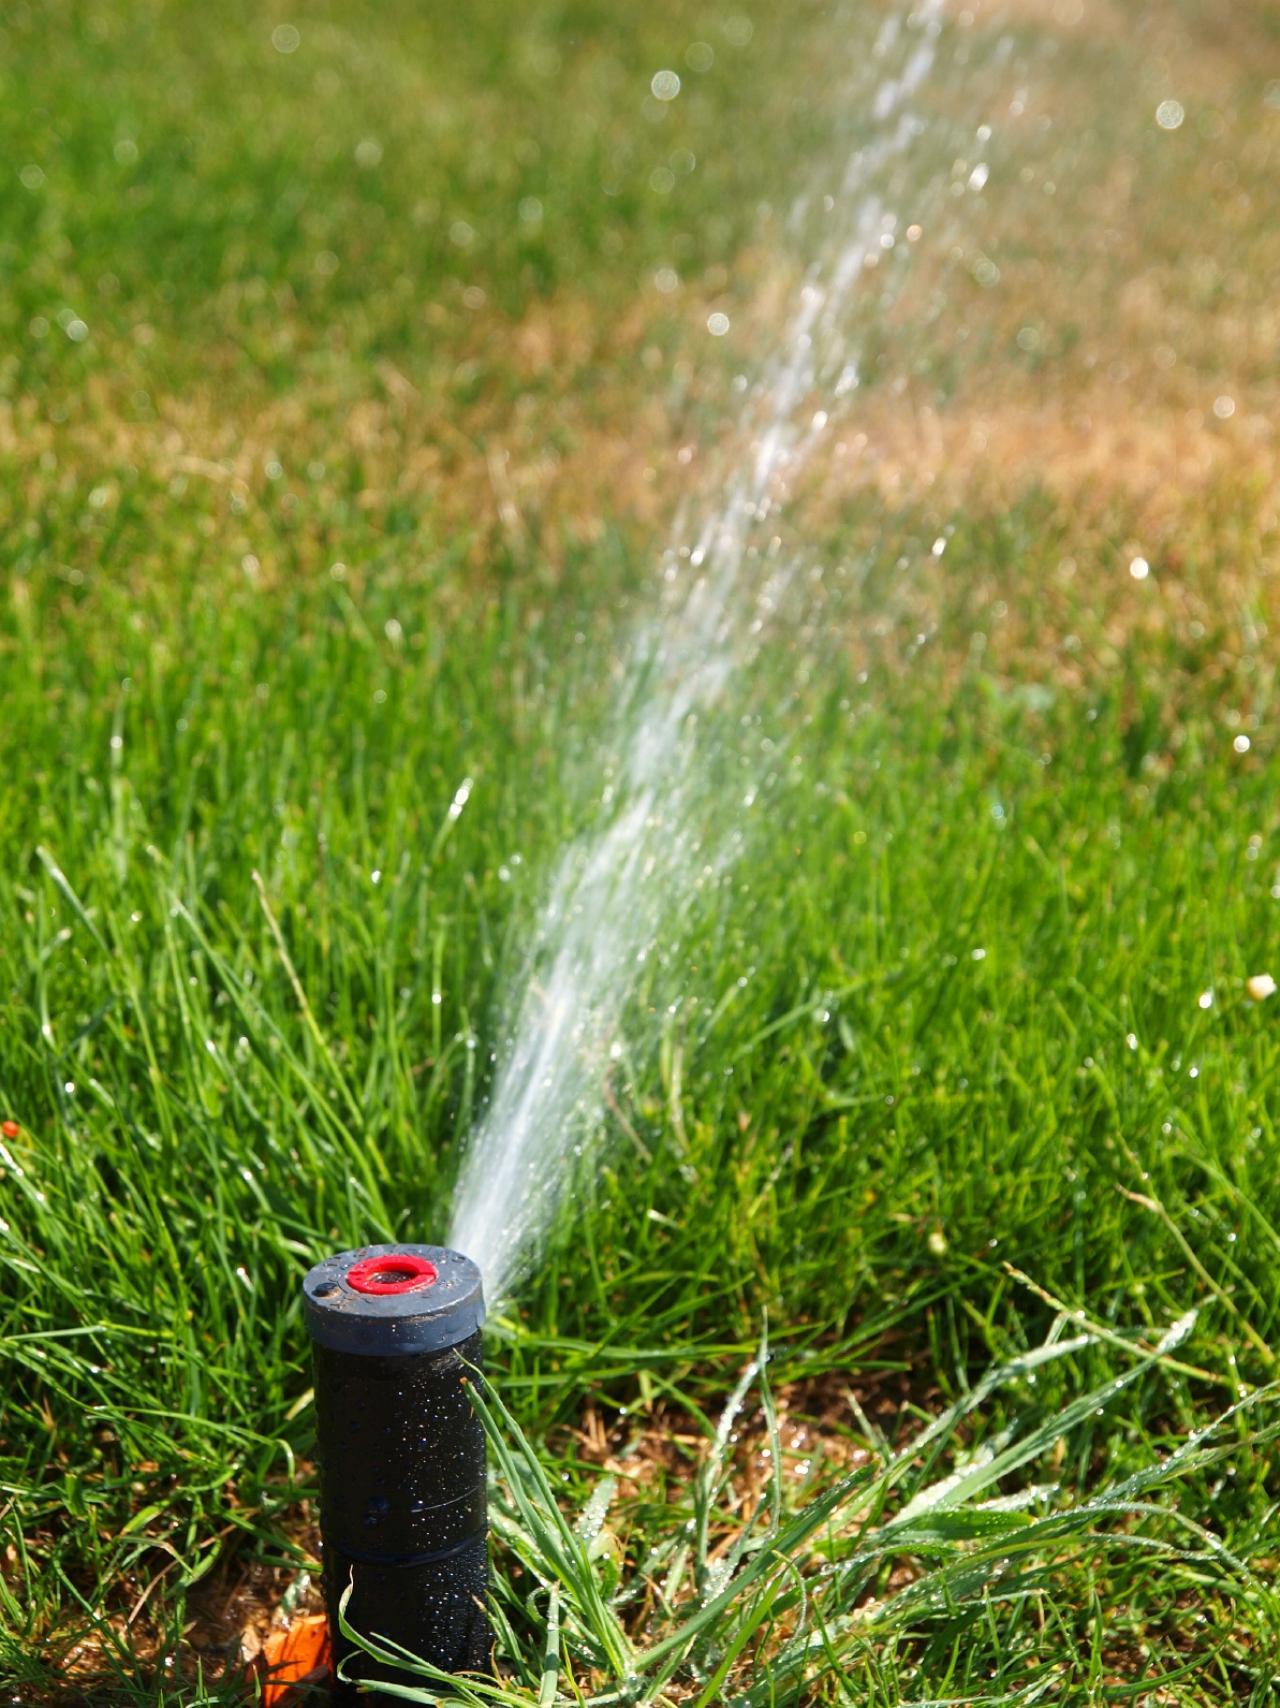 How To Repair Your Lawn Sprinkler Hgtv